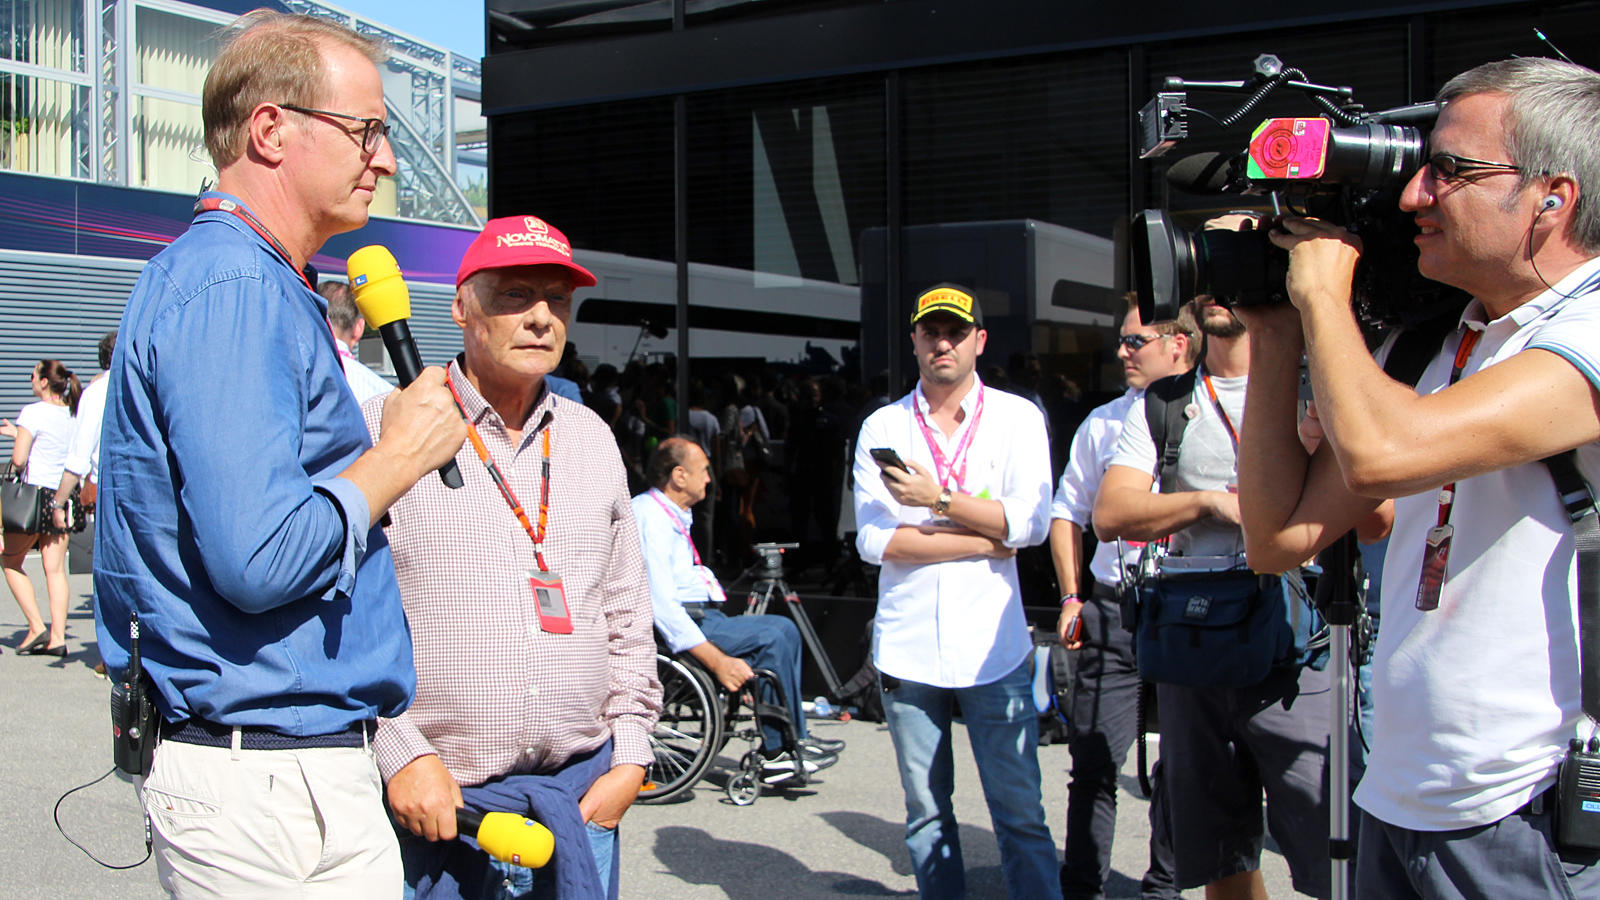 Rtl Gewinnspiel Formel 1